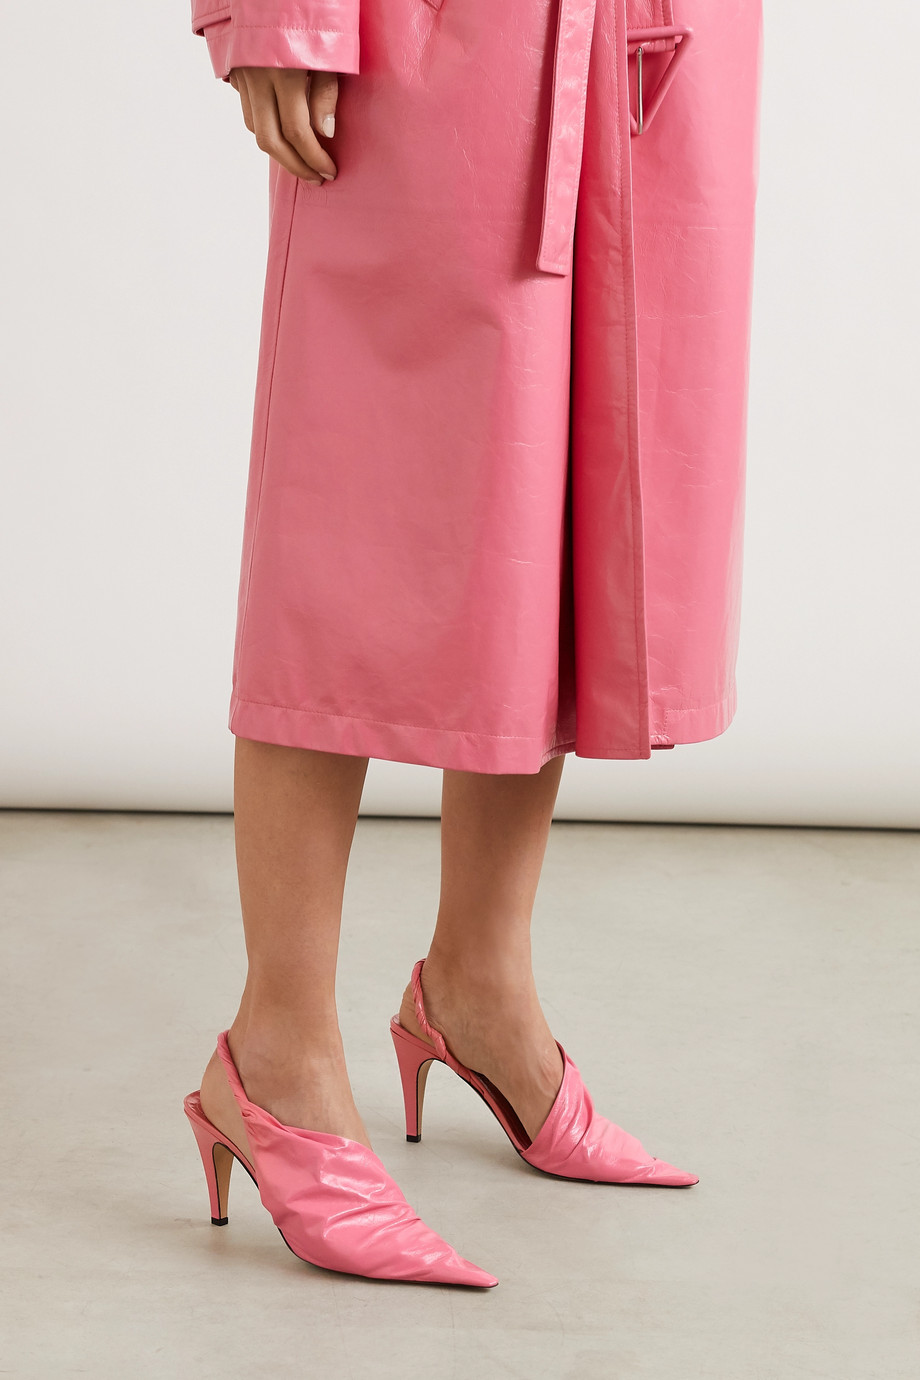 Bottega Veneta 褶皱亮面皮革露跟高跟鞋